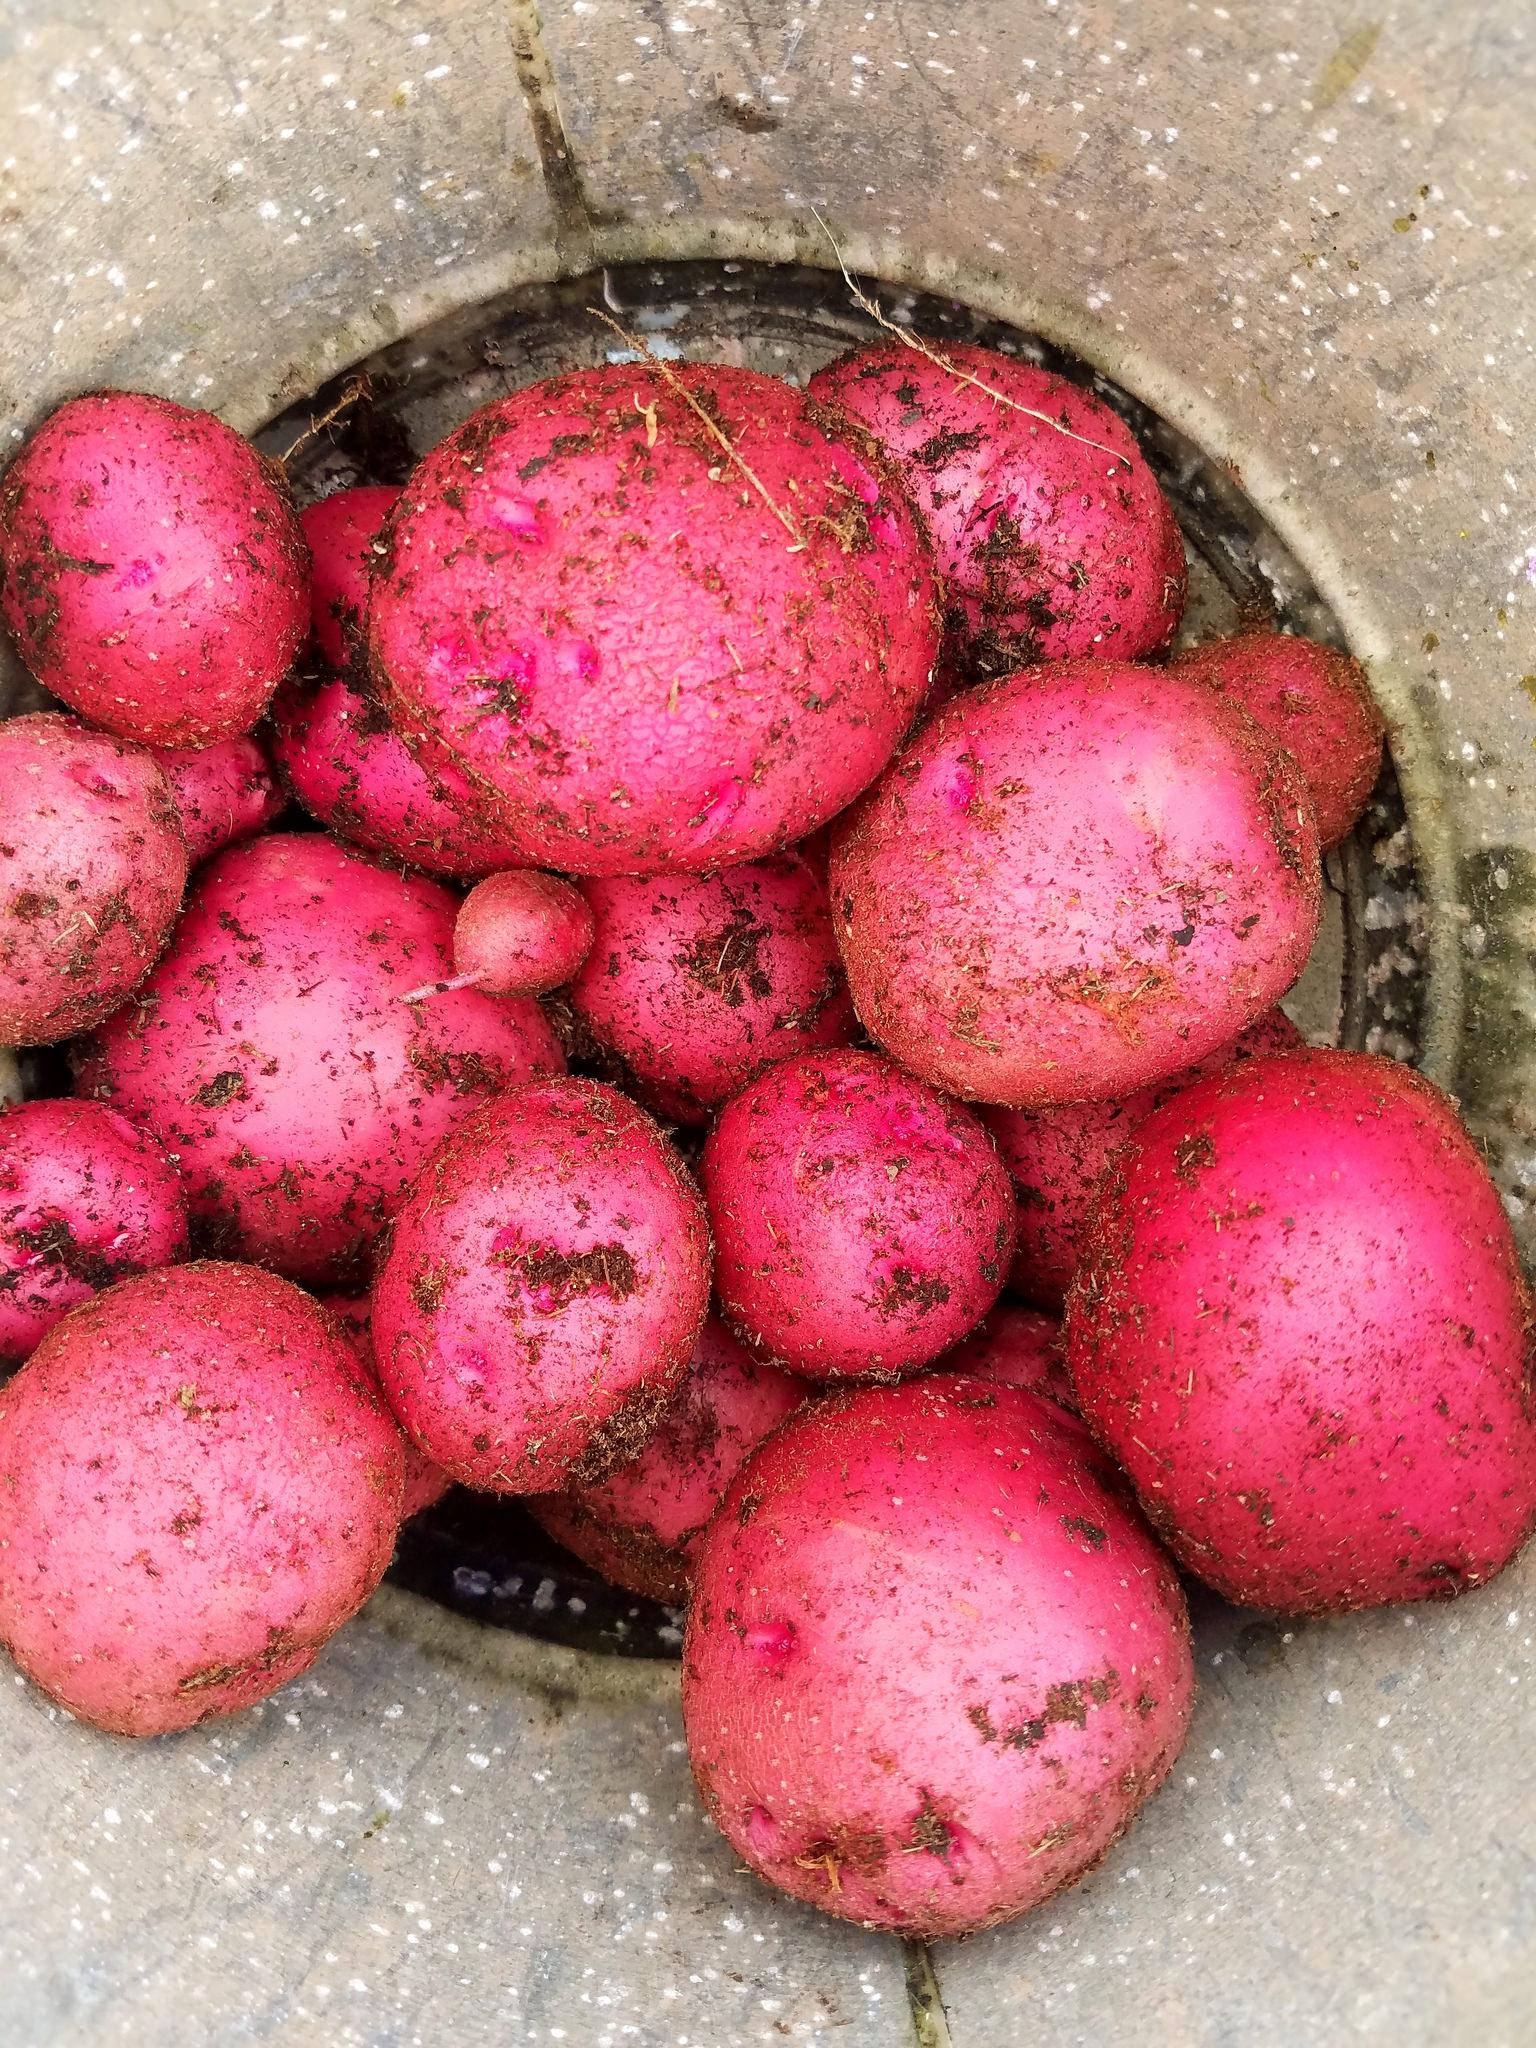 10 EASIEST Vegetables To Grow In Pots